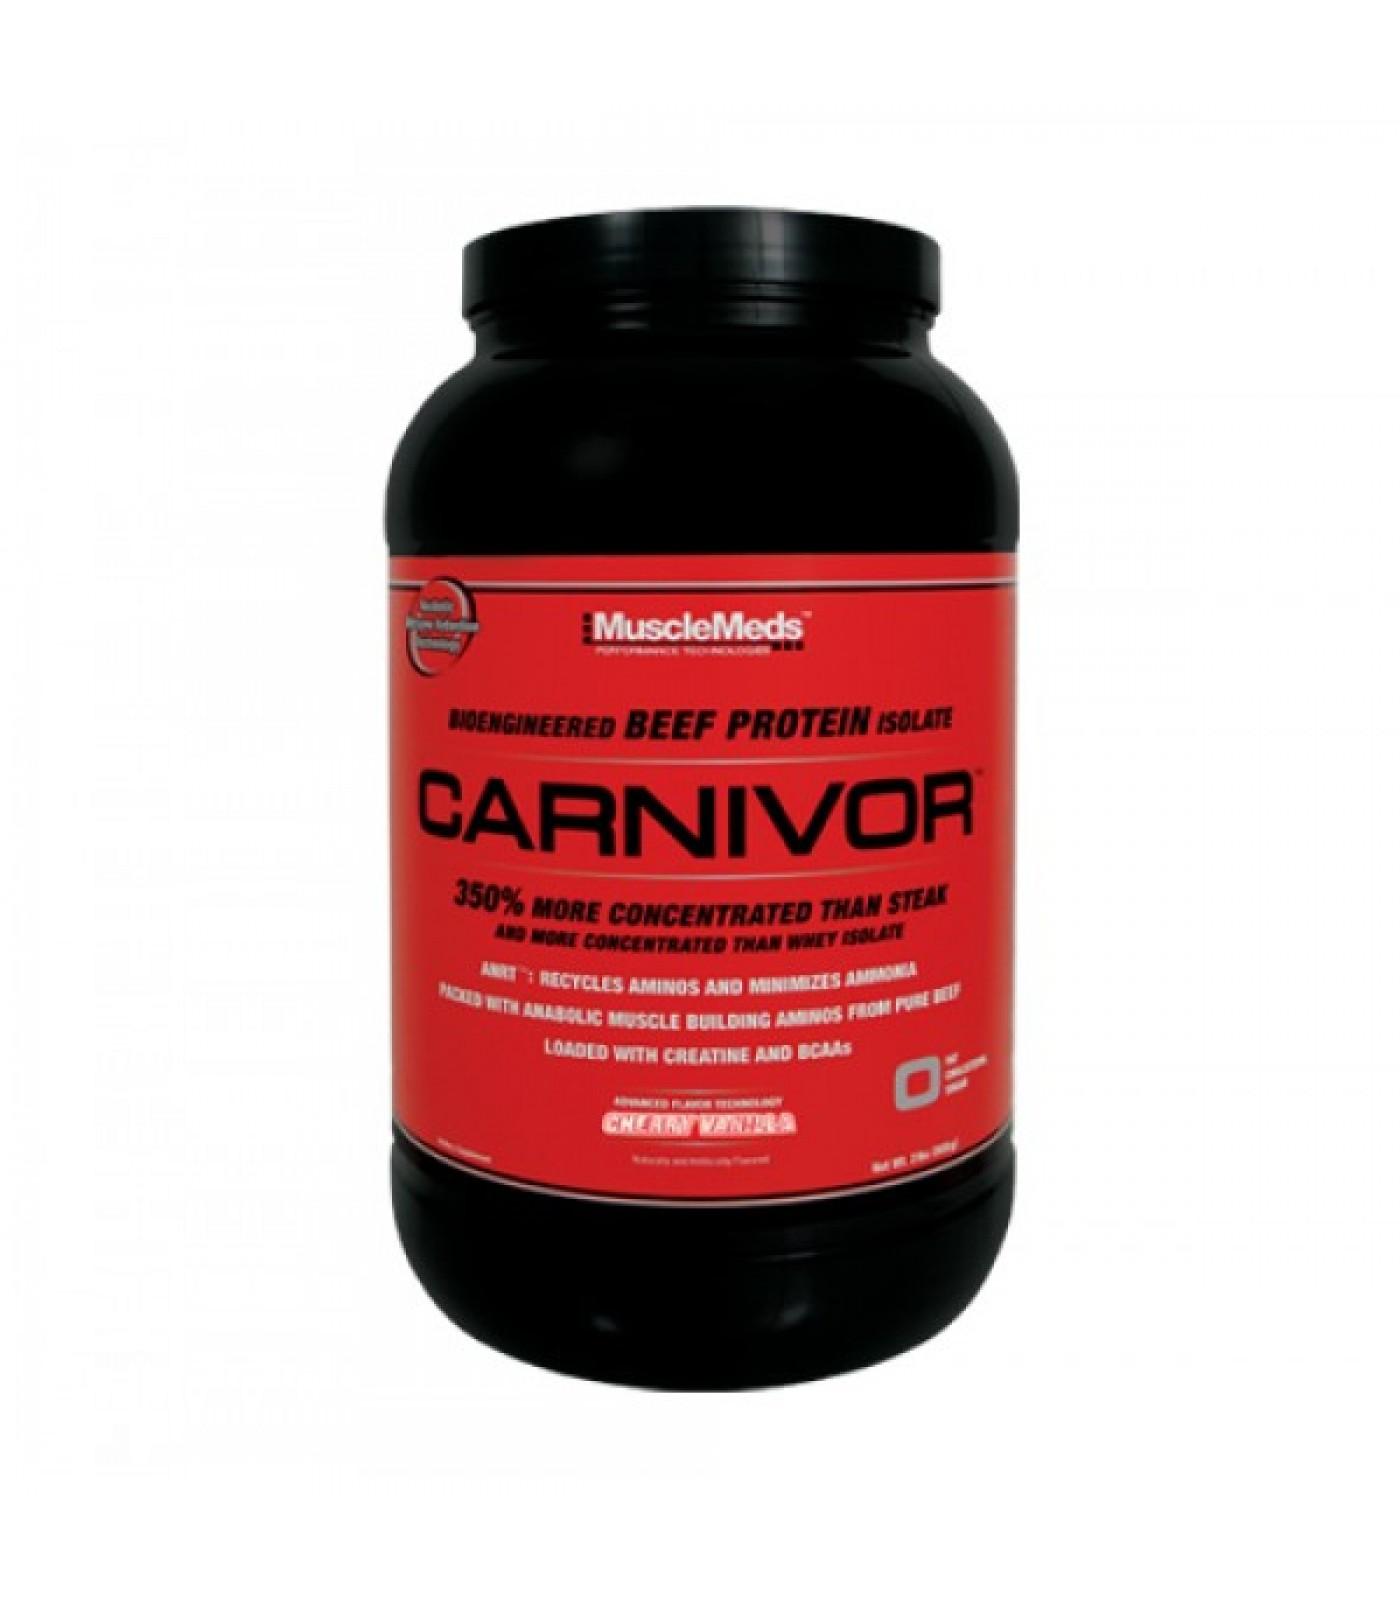 MuscleMeds - Carnivor / 2 lbs.